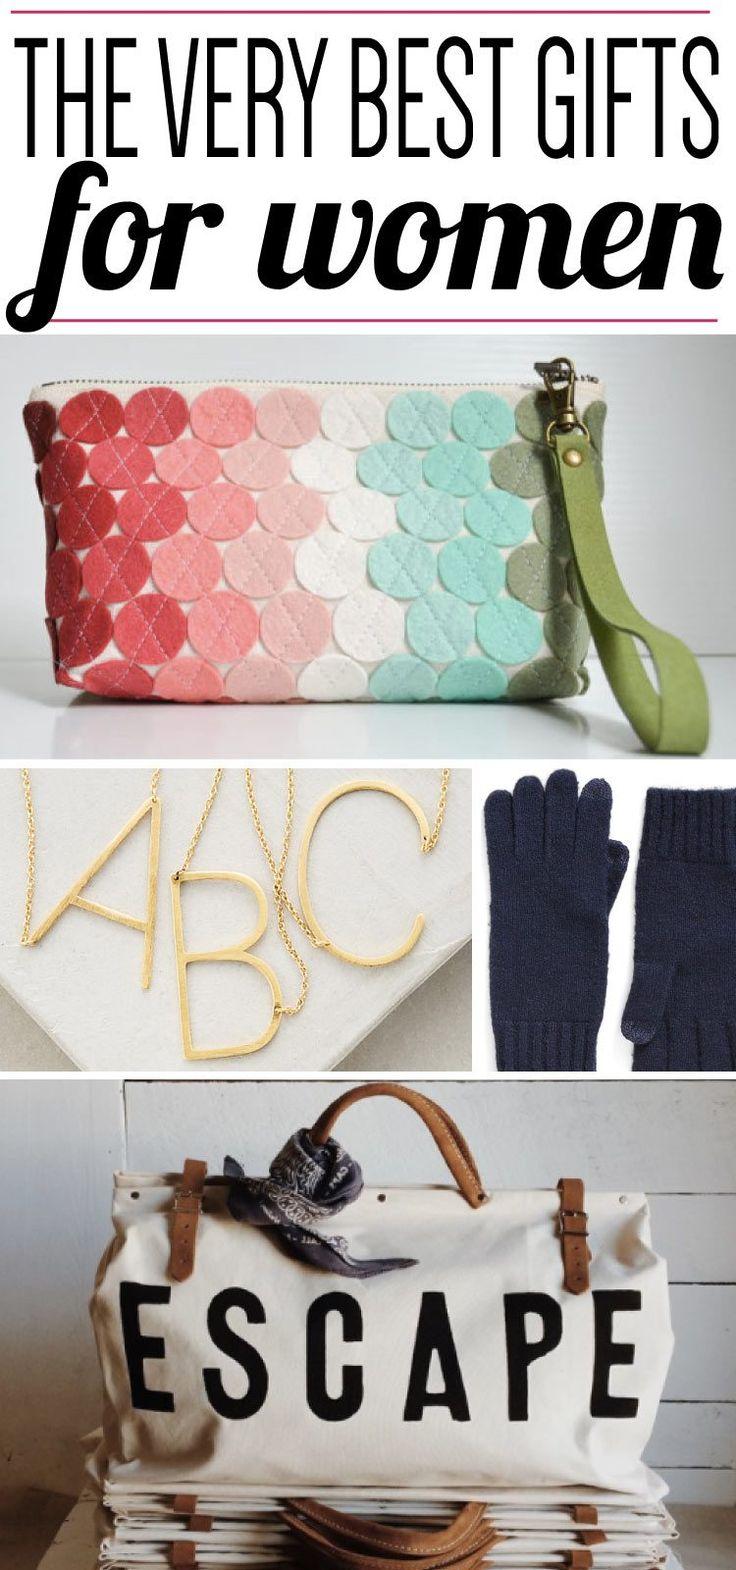 Best 25+ Gifts for female friends ideas on Pinterest   Teen gift ...